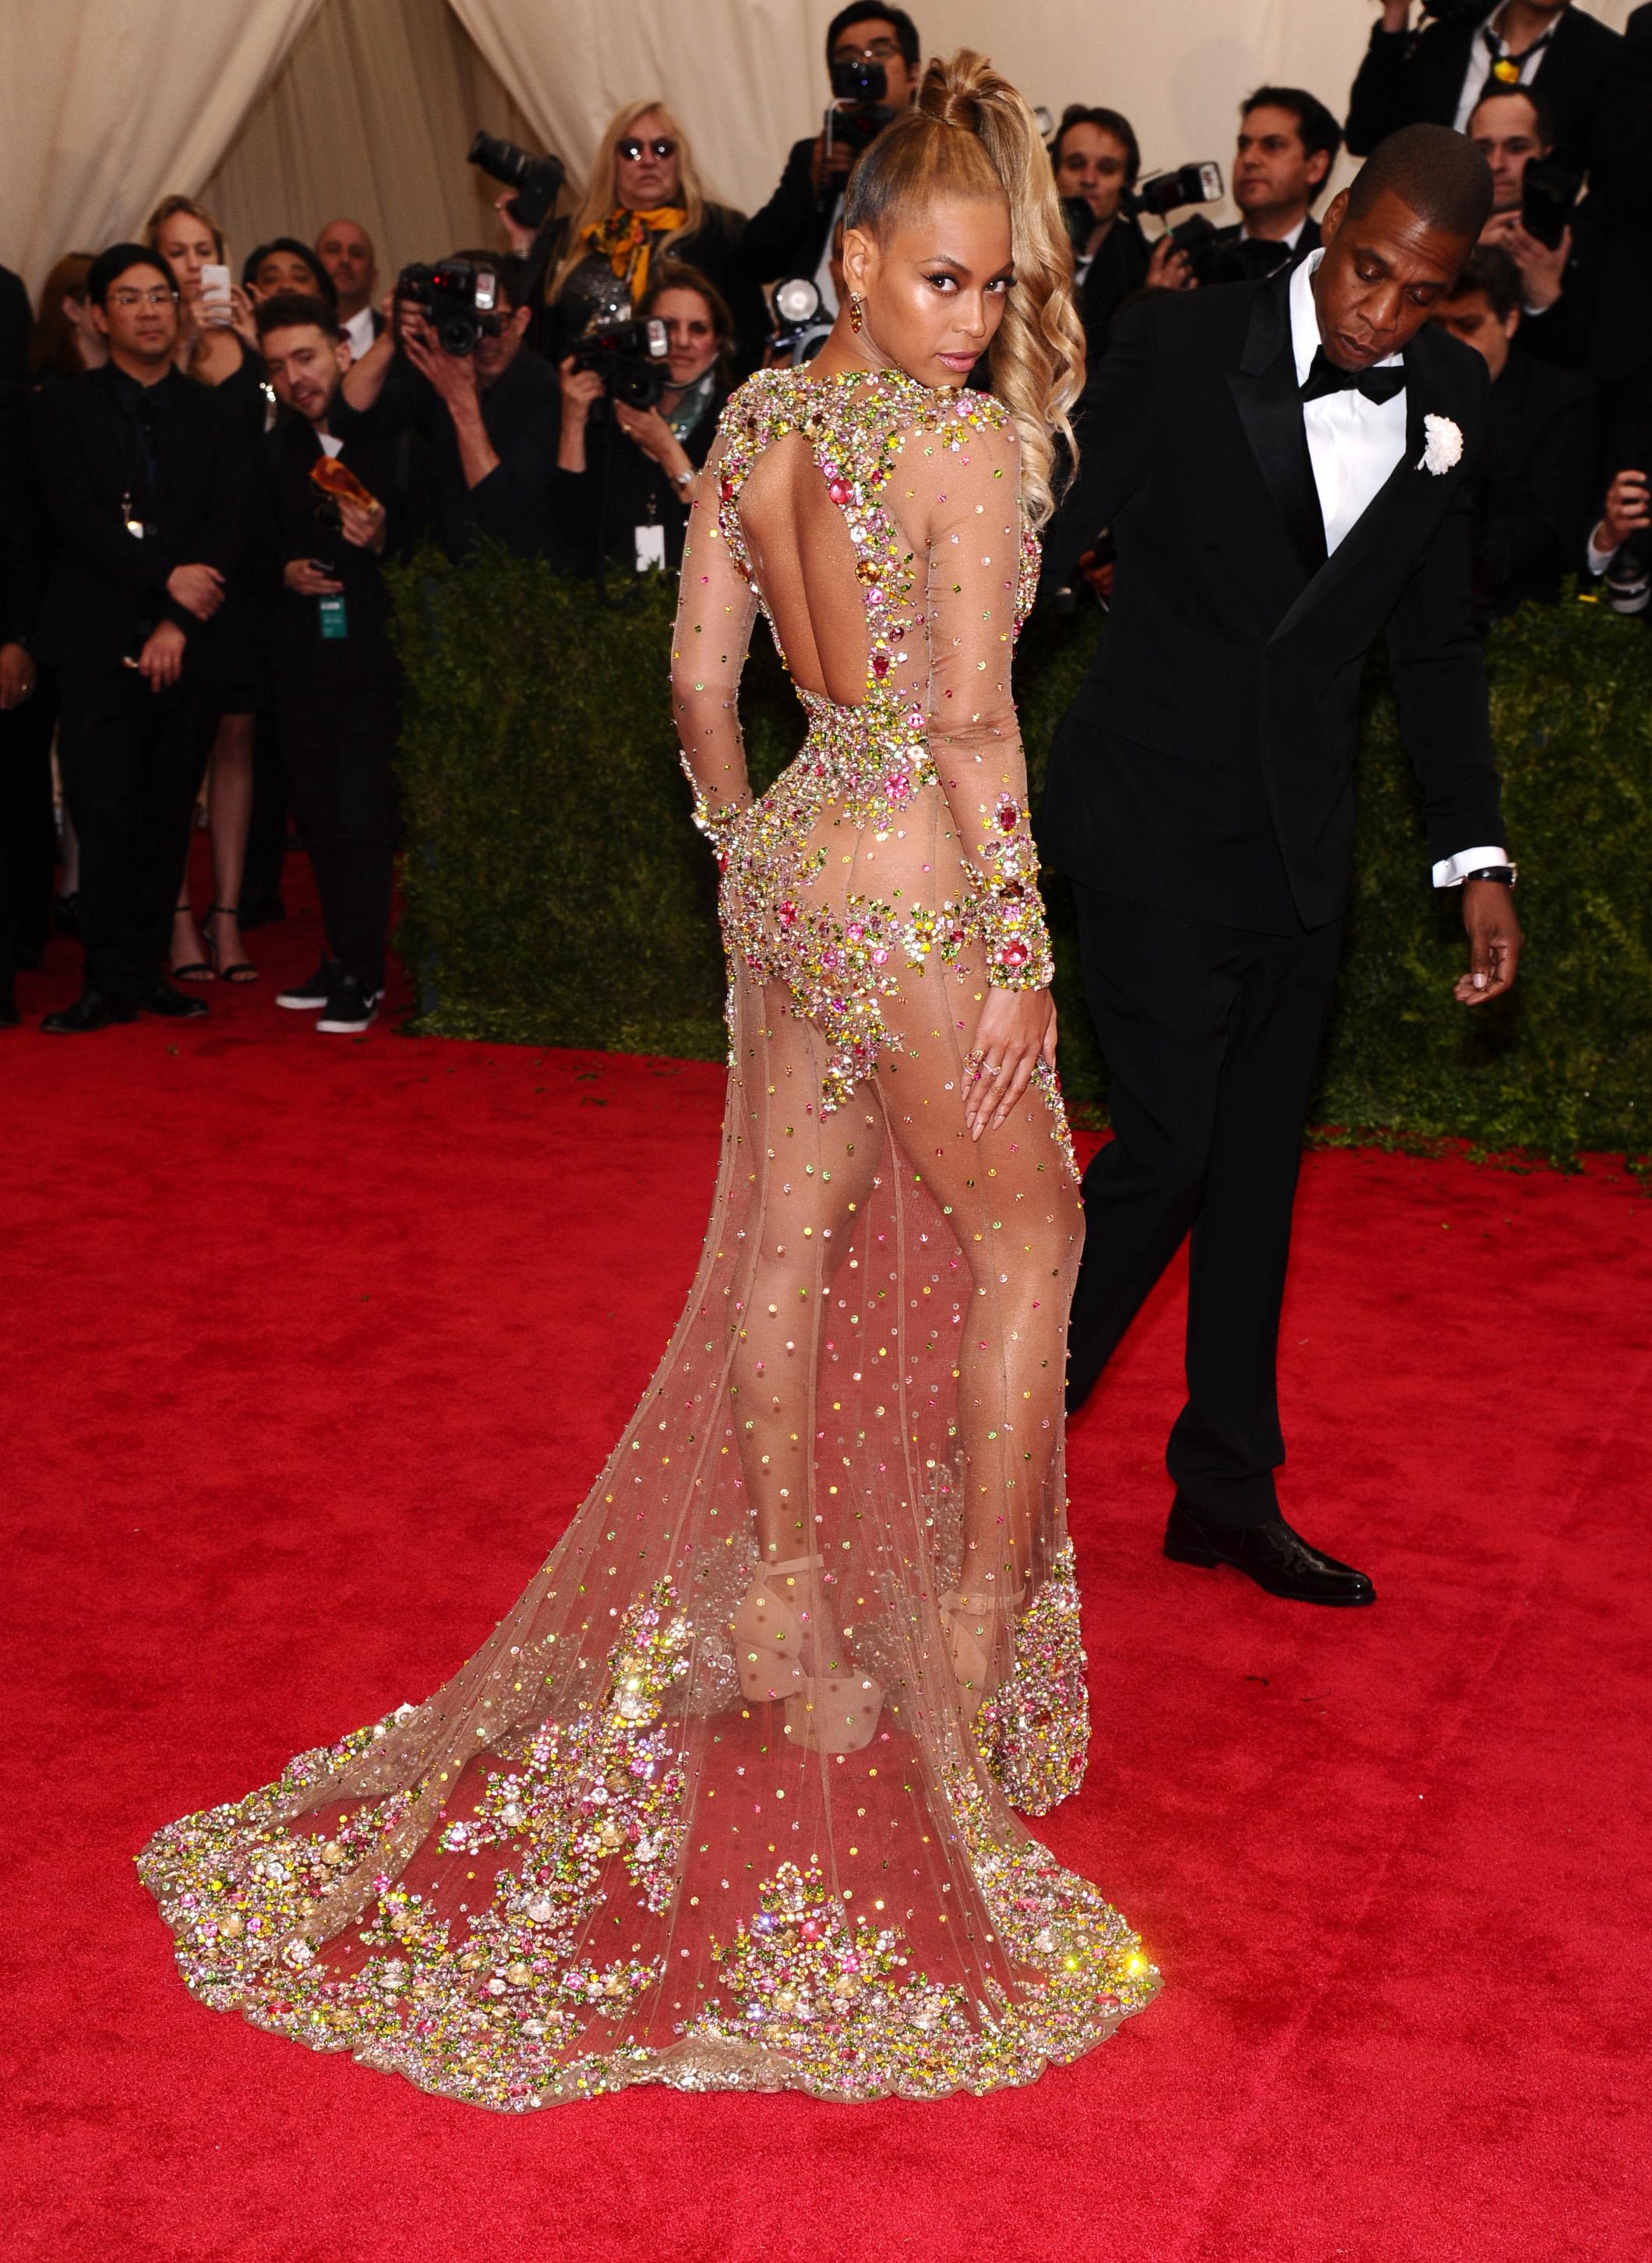 Beyonce shuts down the Met Gala in peekaboo Givenchy